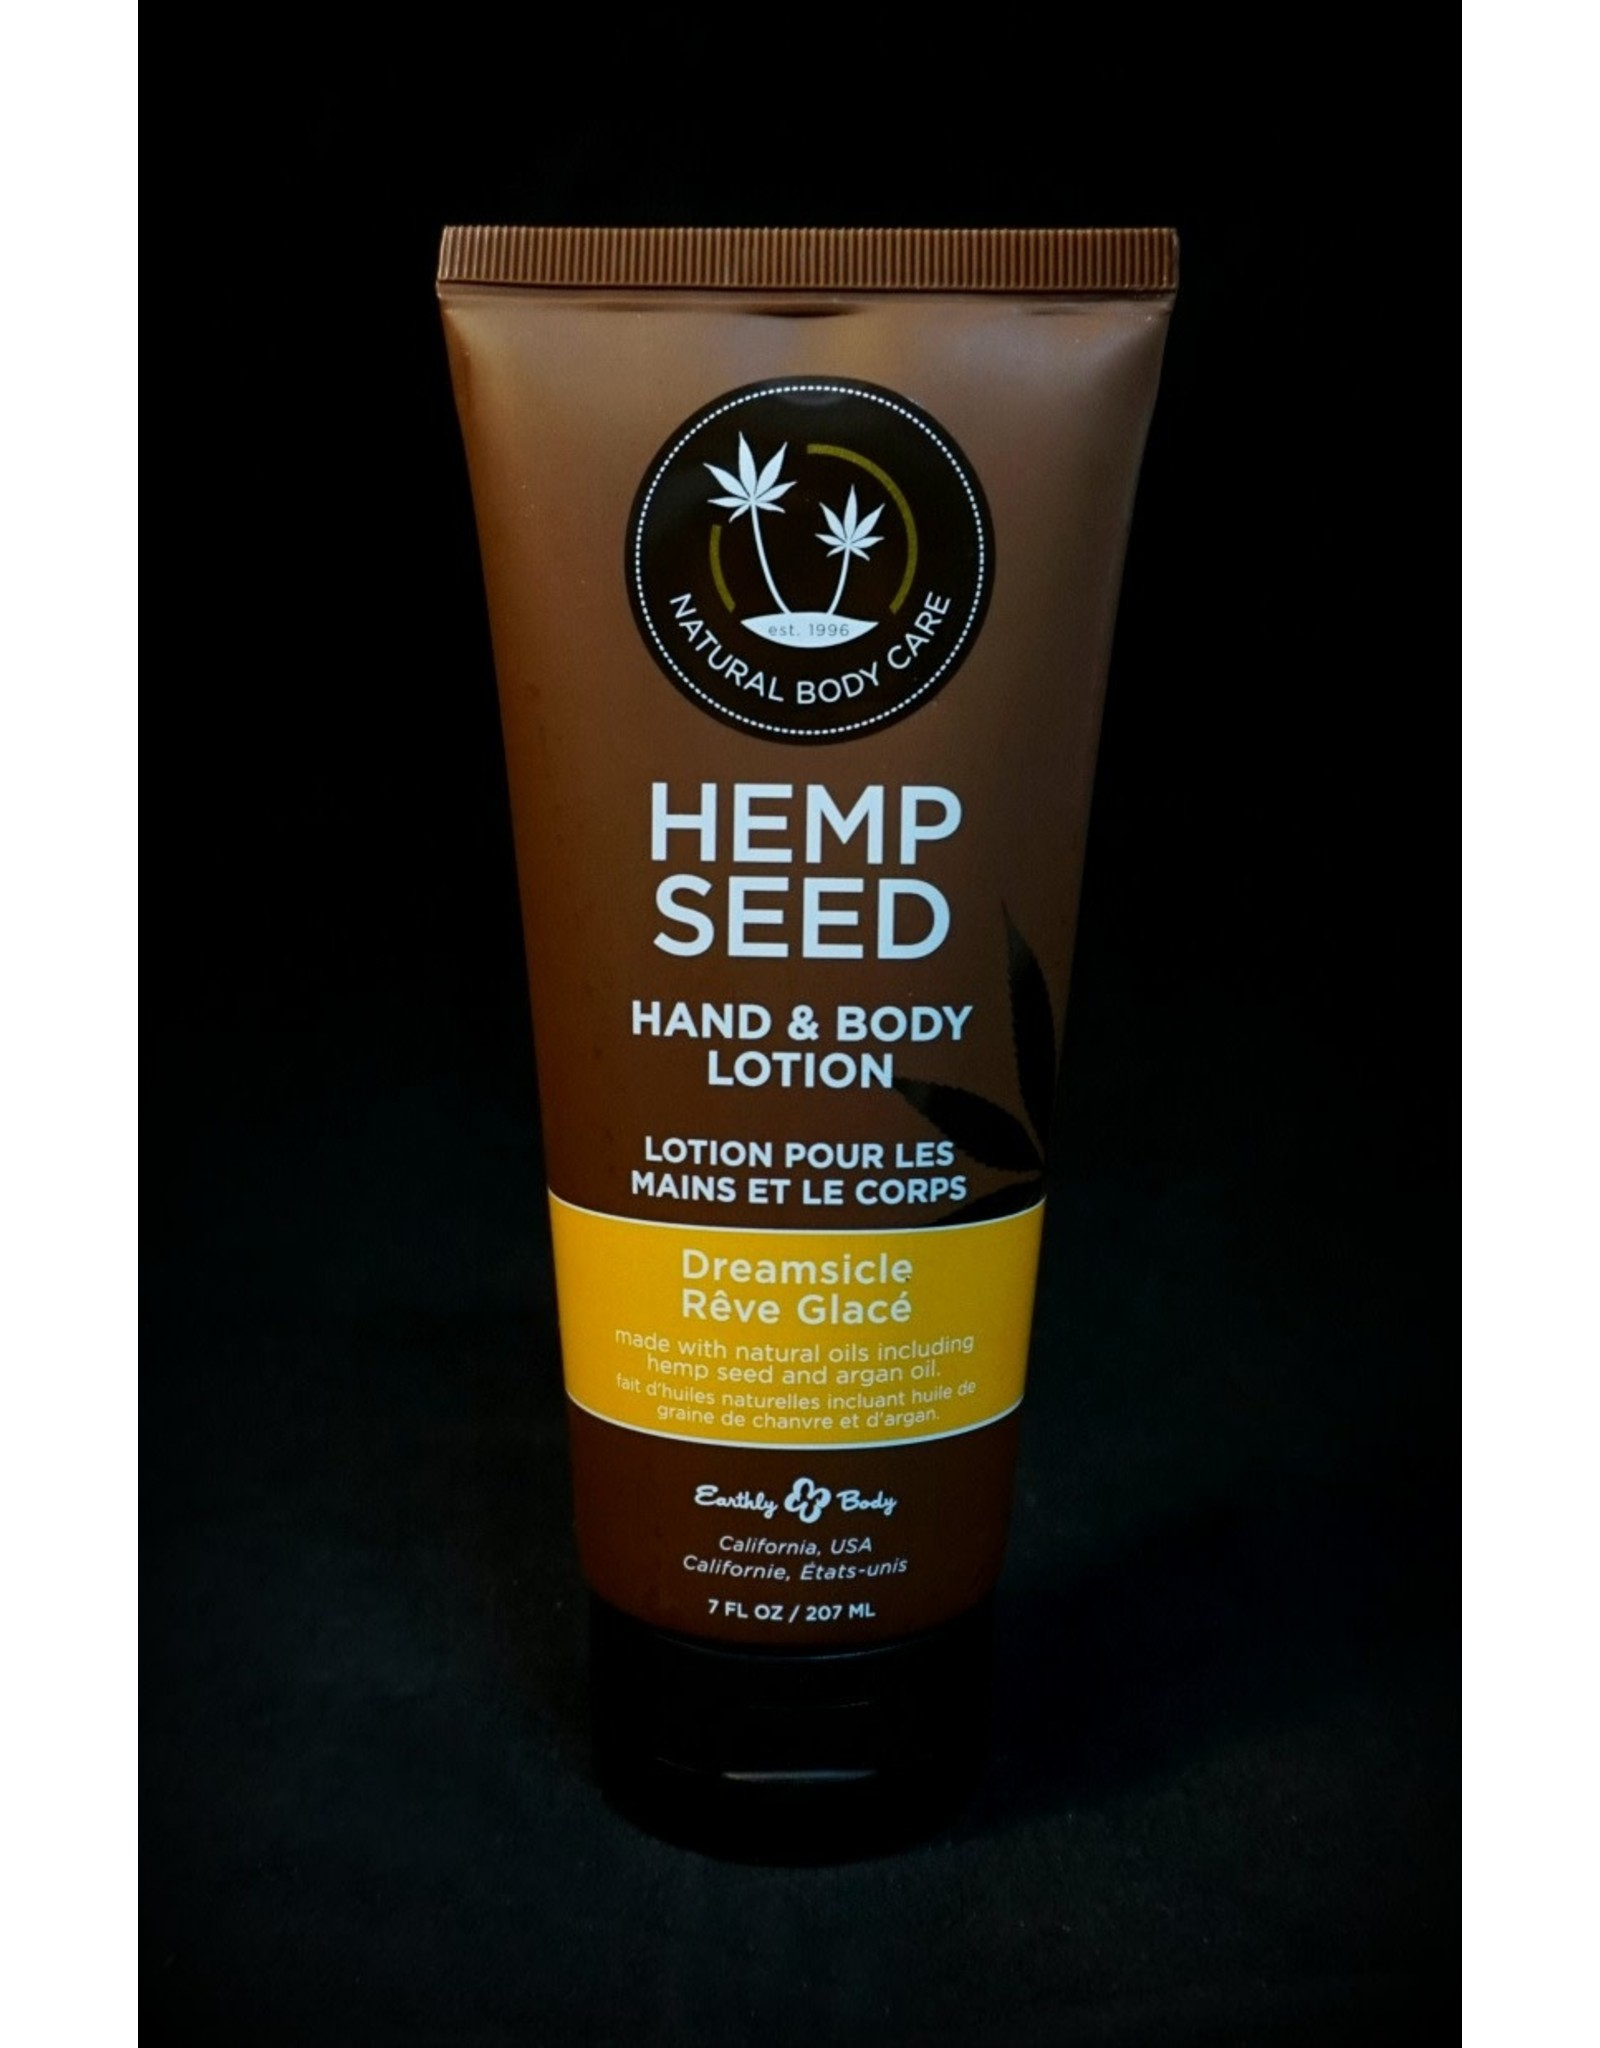 Earthly Hemp Seed Body Lotion 7oz Dreamsicle